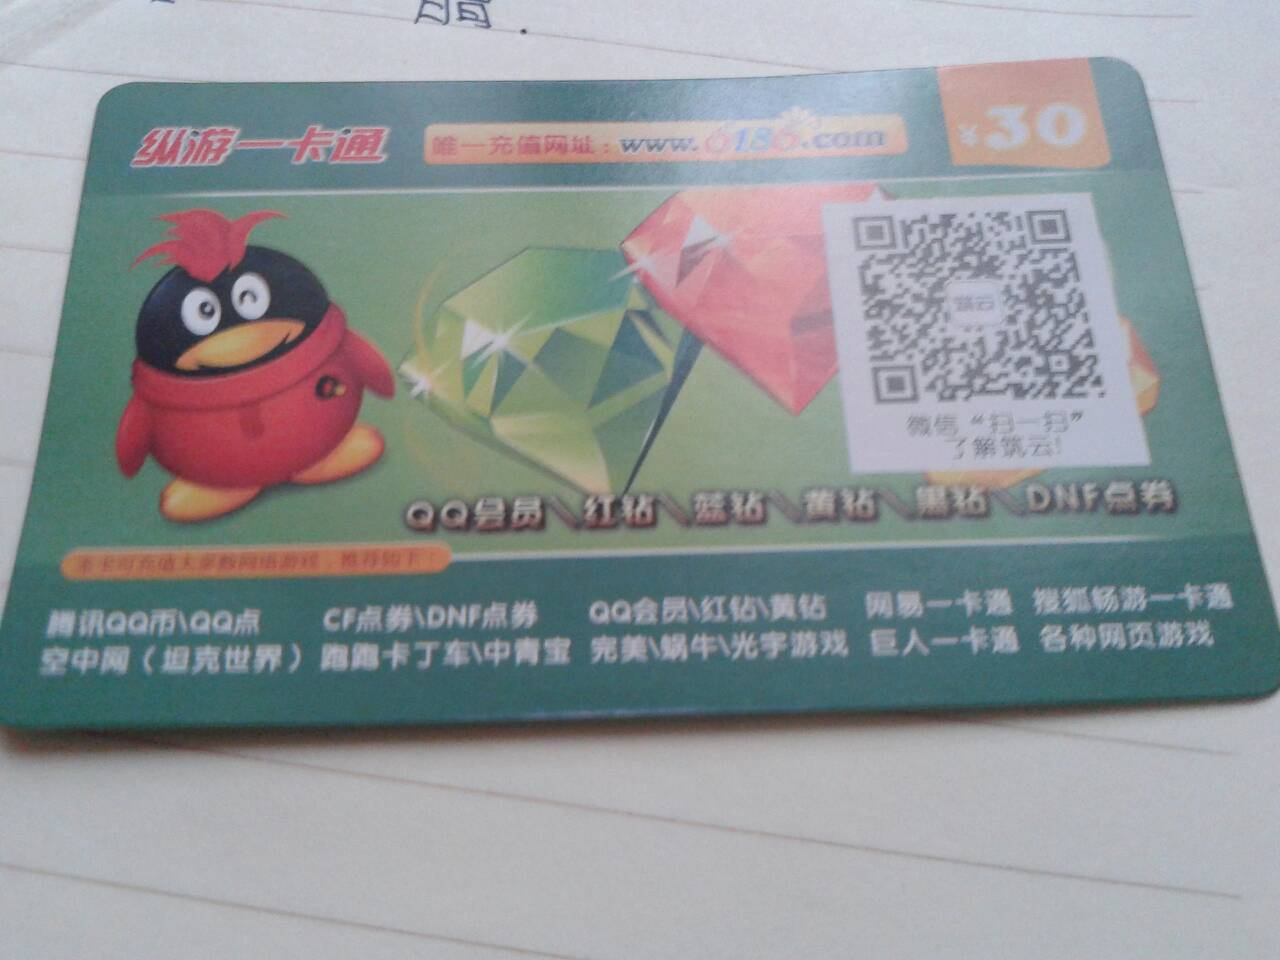 qq币可以买点卡吗_我买了一张30元的点卡,想充值qq会员,接下来该怎么弄?_百度知道